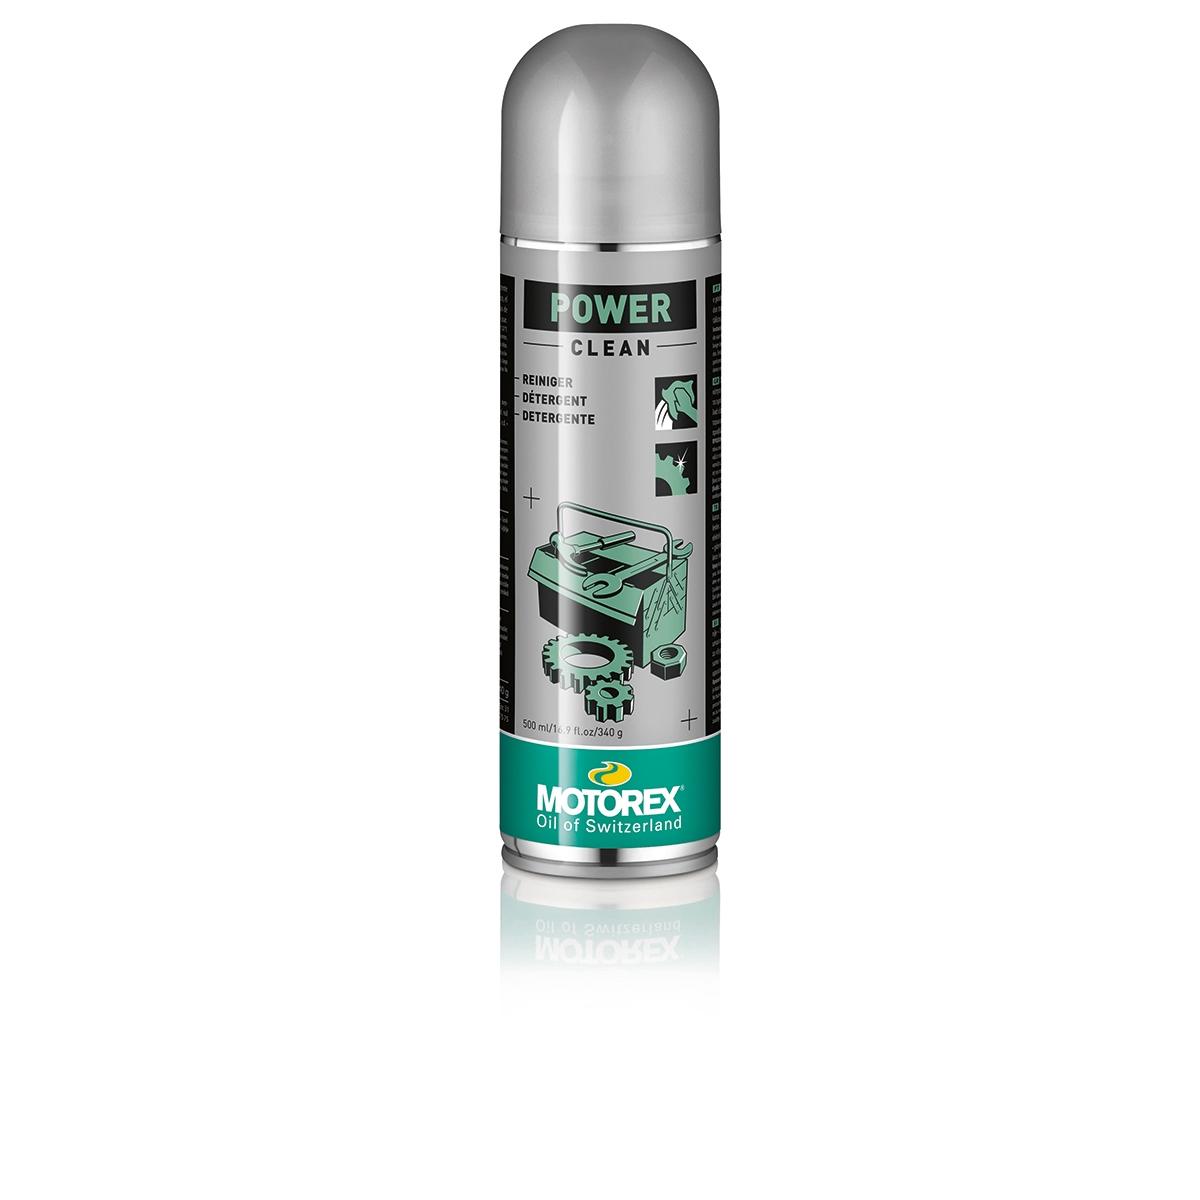 Universal Spray Degreaser Power Clean Aerosol 500ml